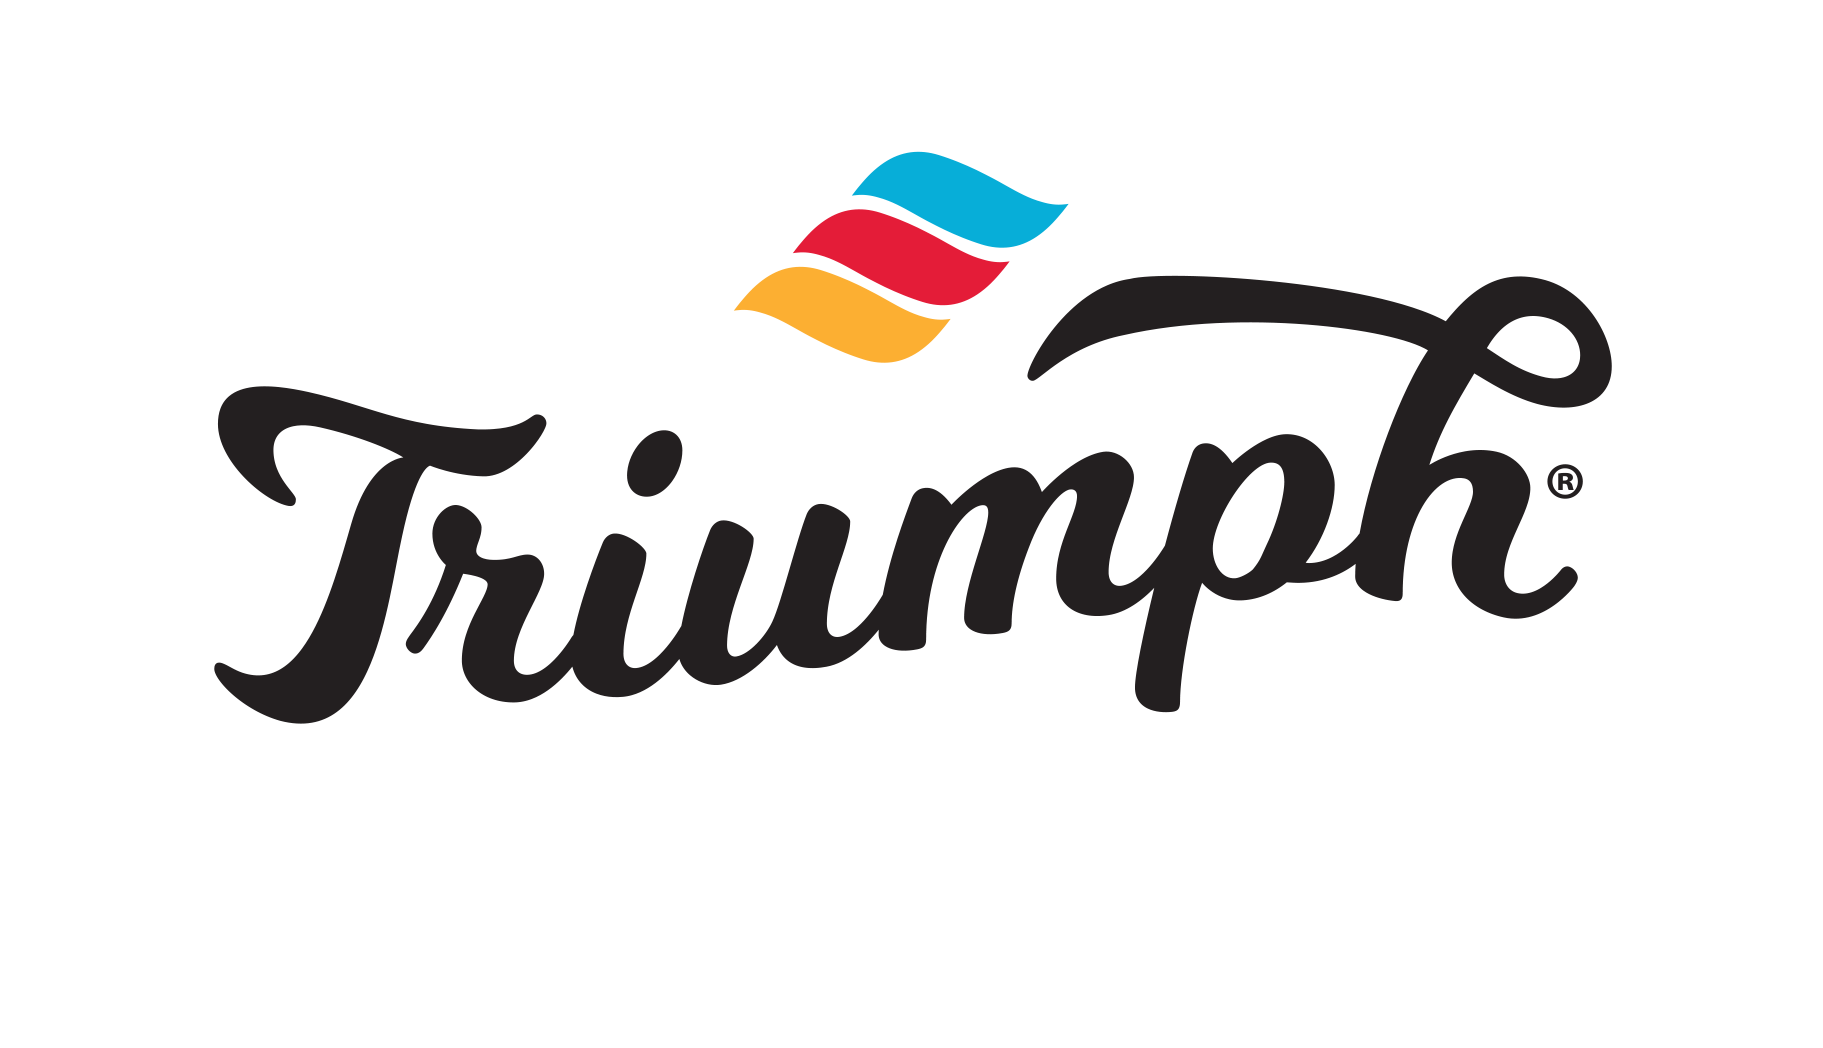 Triumph Logo Image